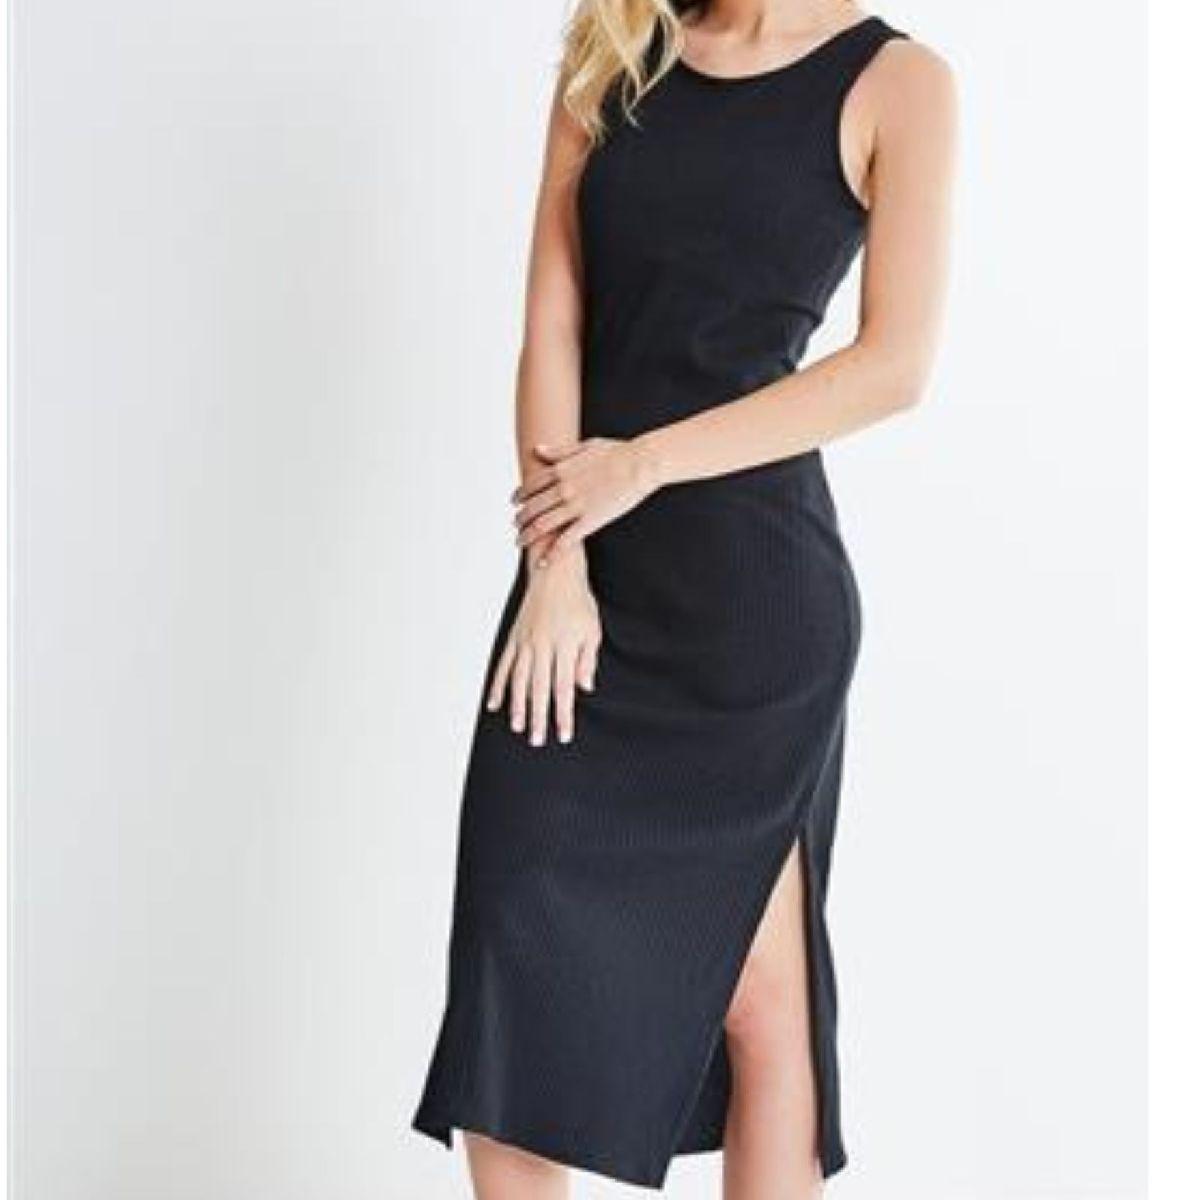 Vestido Longo Tecido Glitter Com Abertura Lateral Na Perna Vestido Feminino Dank Nunca Usado 35405494 Enjoei